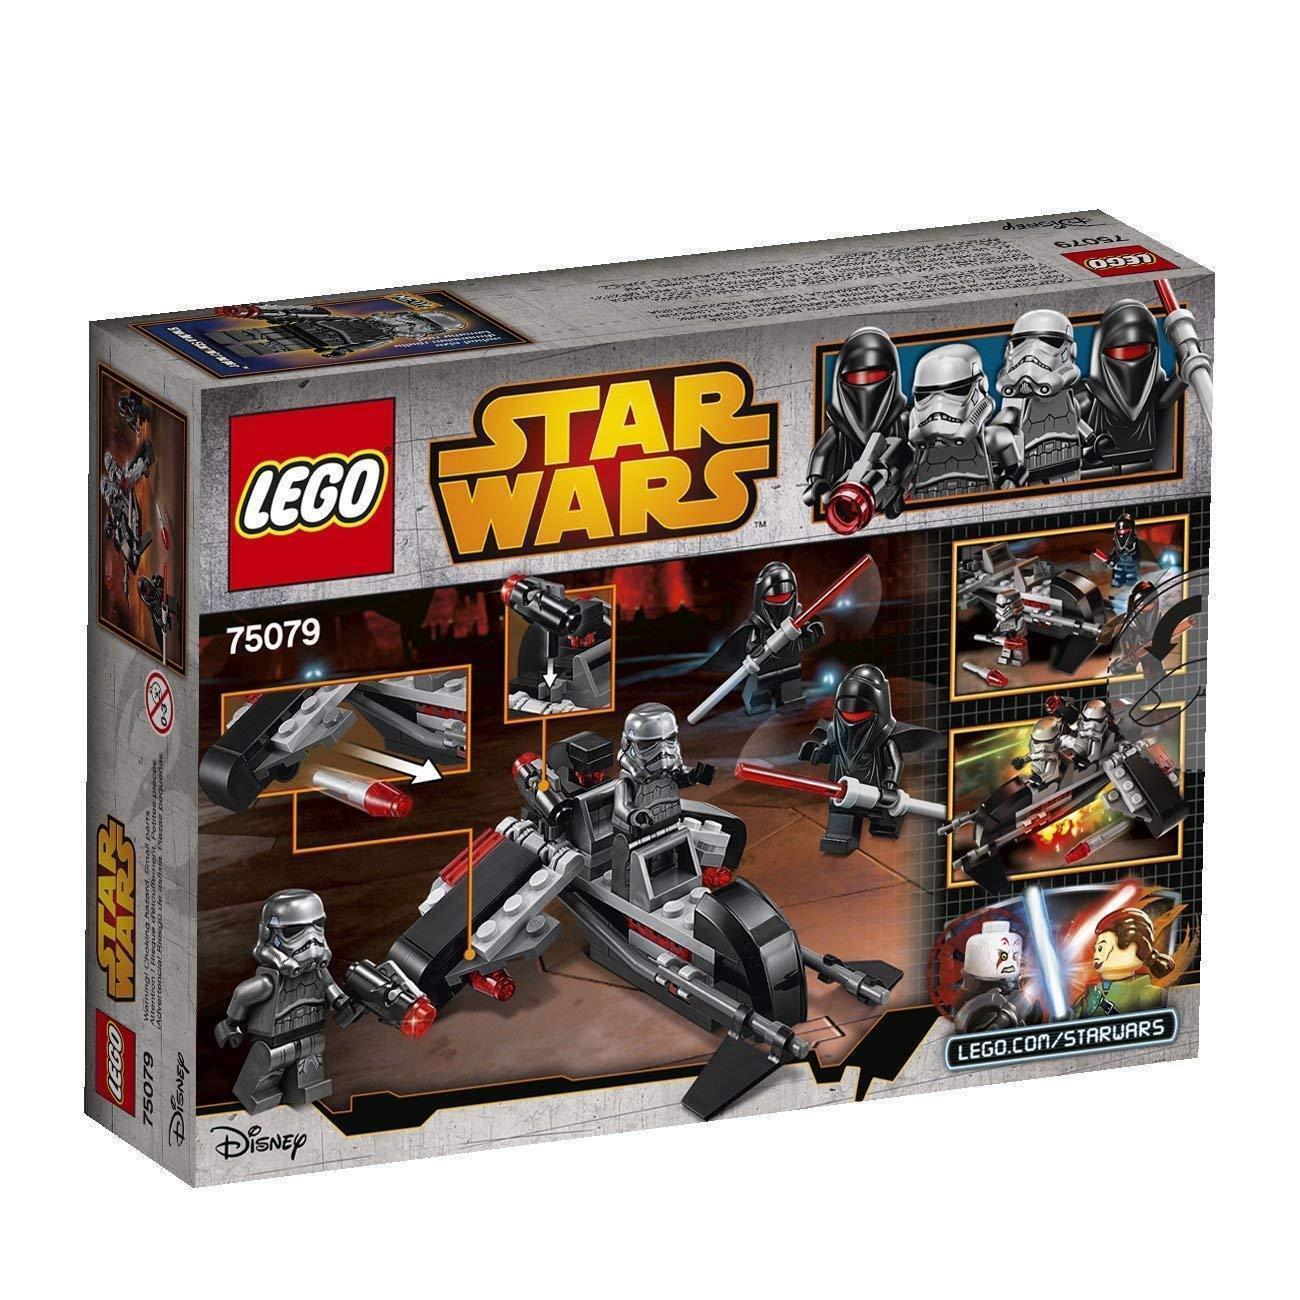 LEGO Star Wars Wars Wars Shadow Troopers 75079 a99239